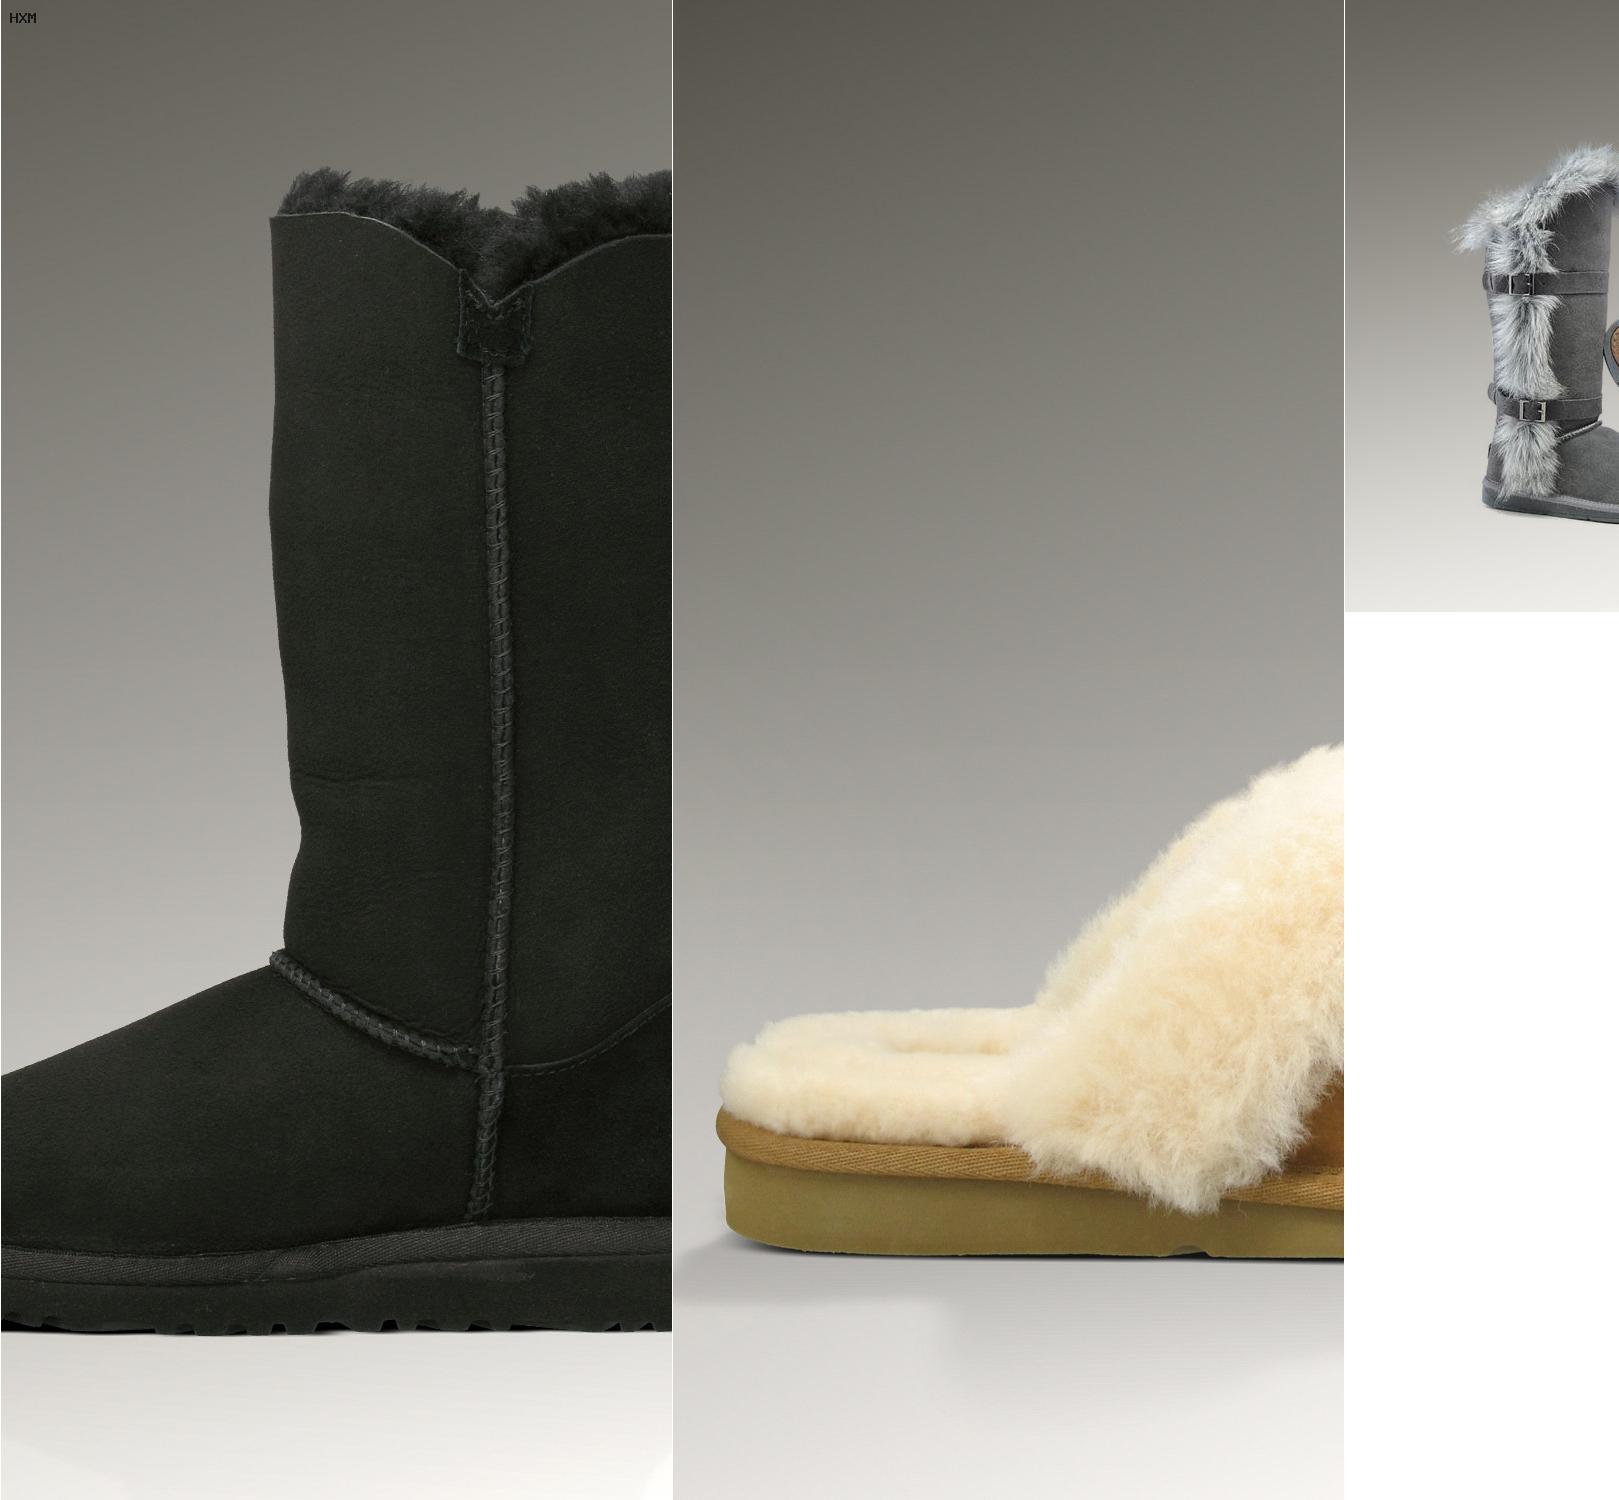 botas ugg mujer grises